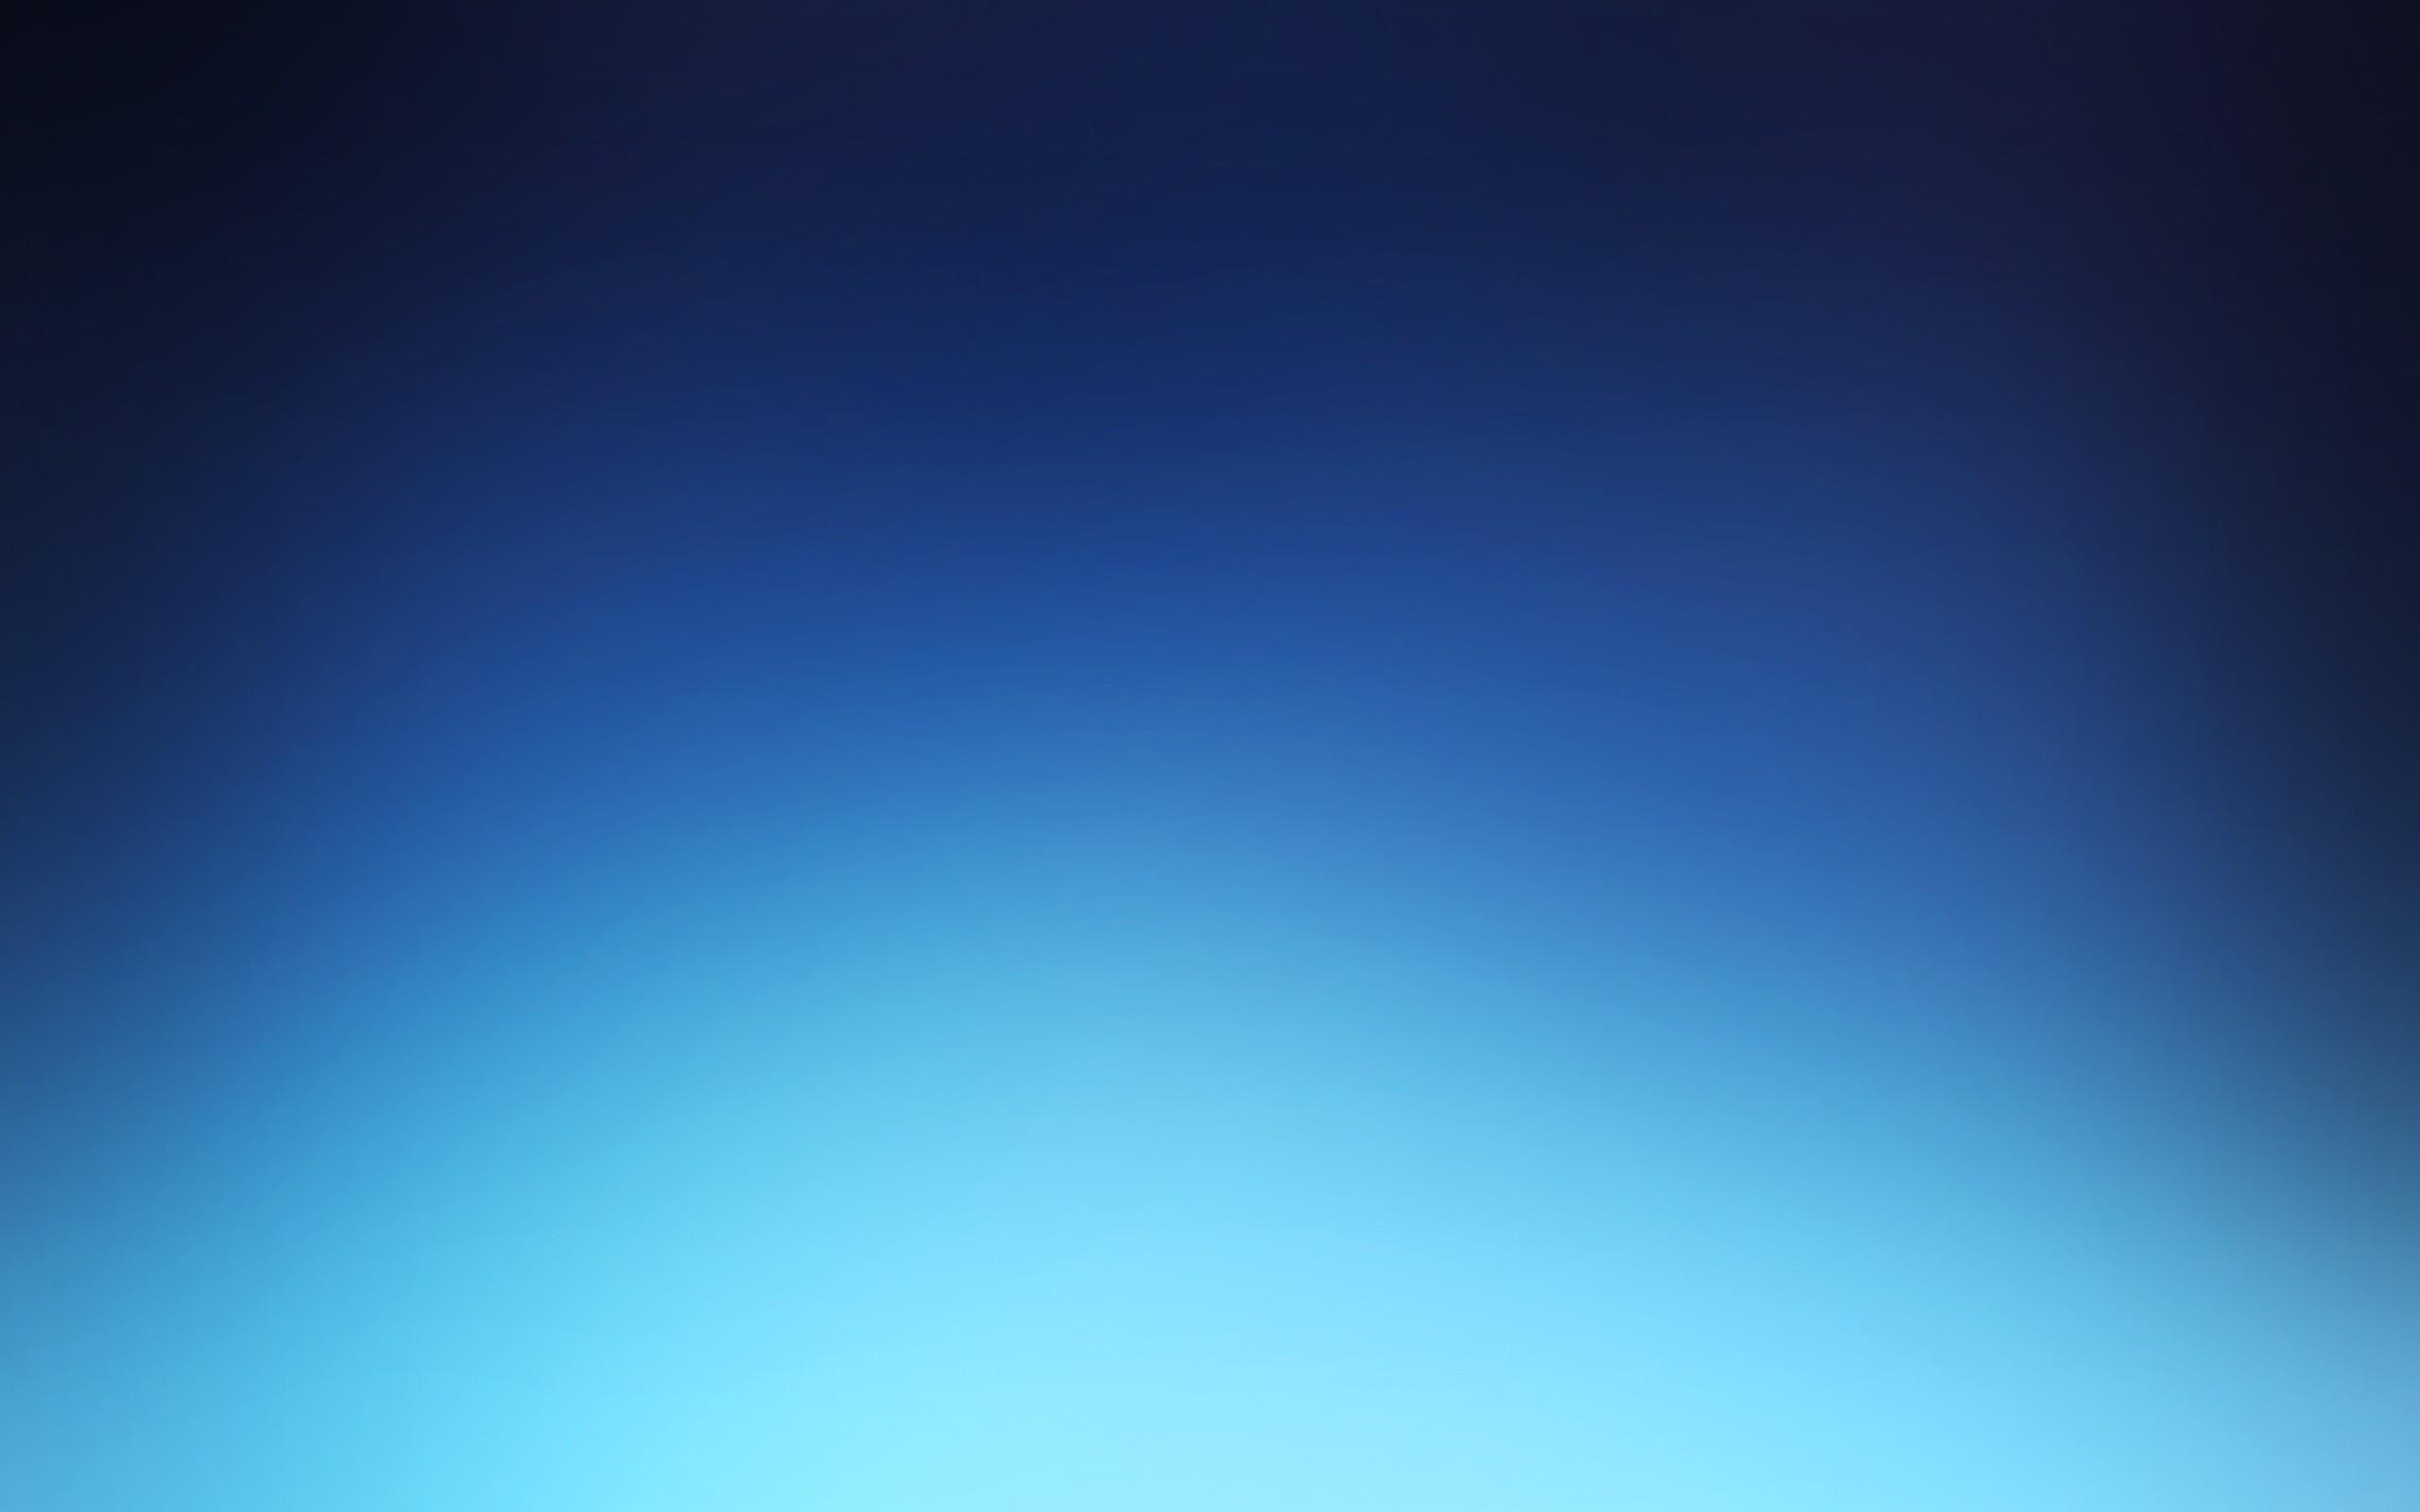 Blue color background wallpaper 2560x1600 1788 WallpaperUP 2560x1600